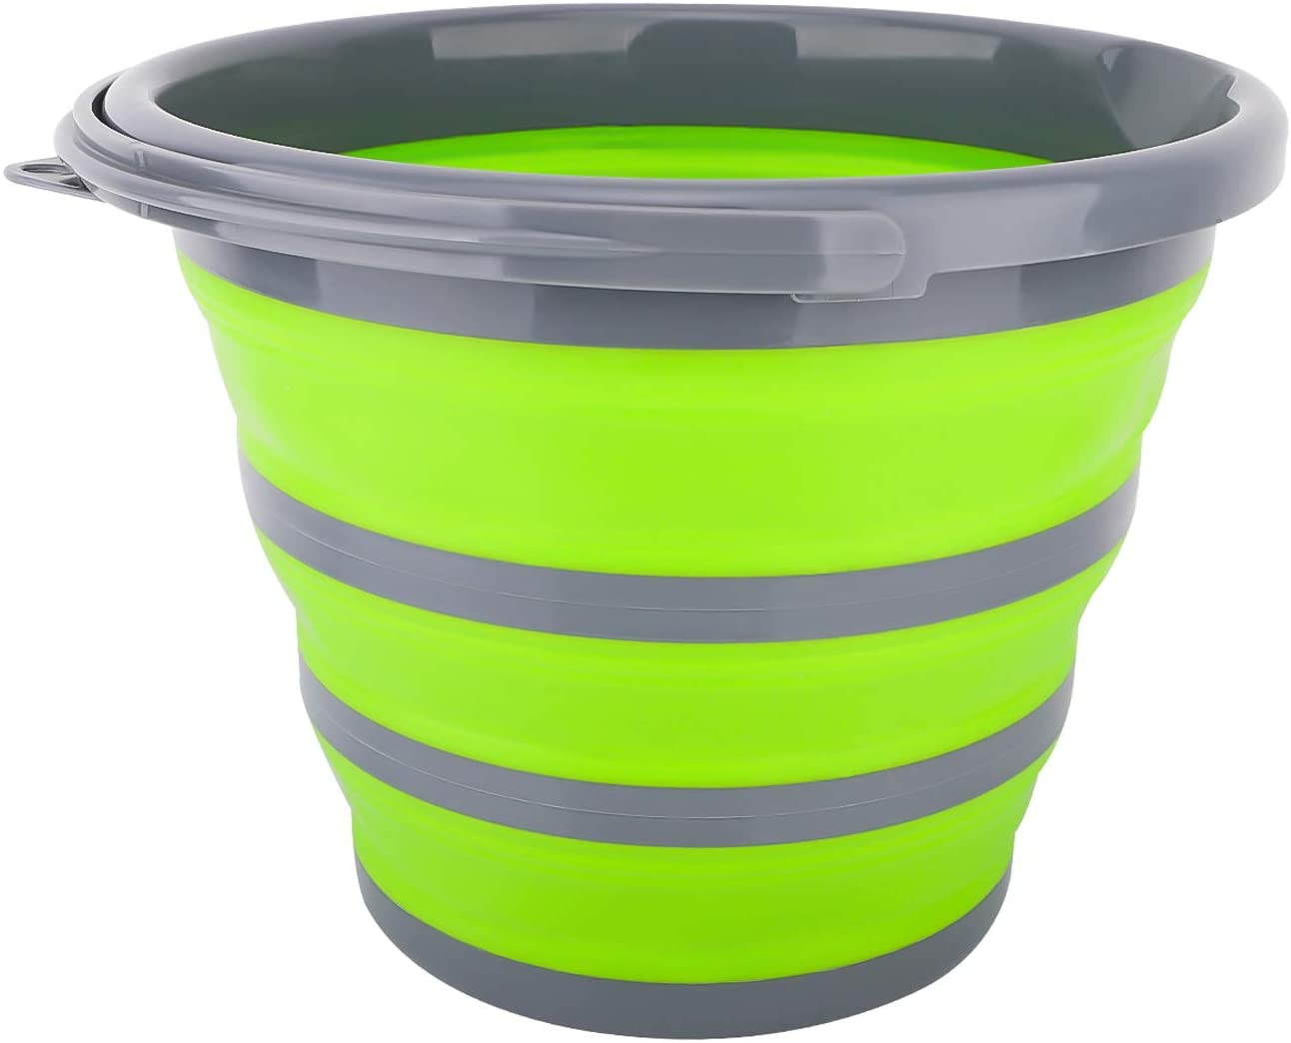 Folding Bucket v1 Groundbait Bowl Bait Bowl LARGE CARRYALL 30cm x 15cm NGT